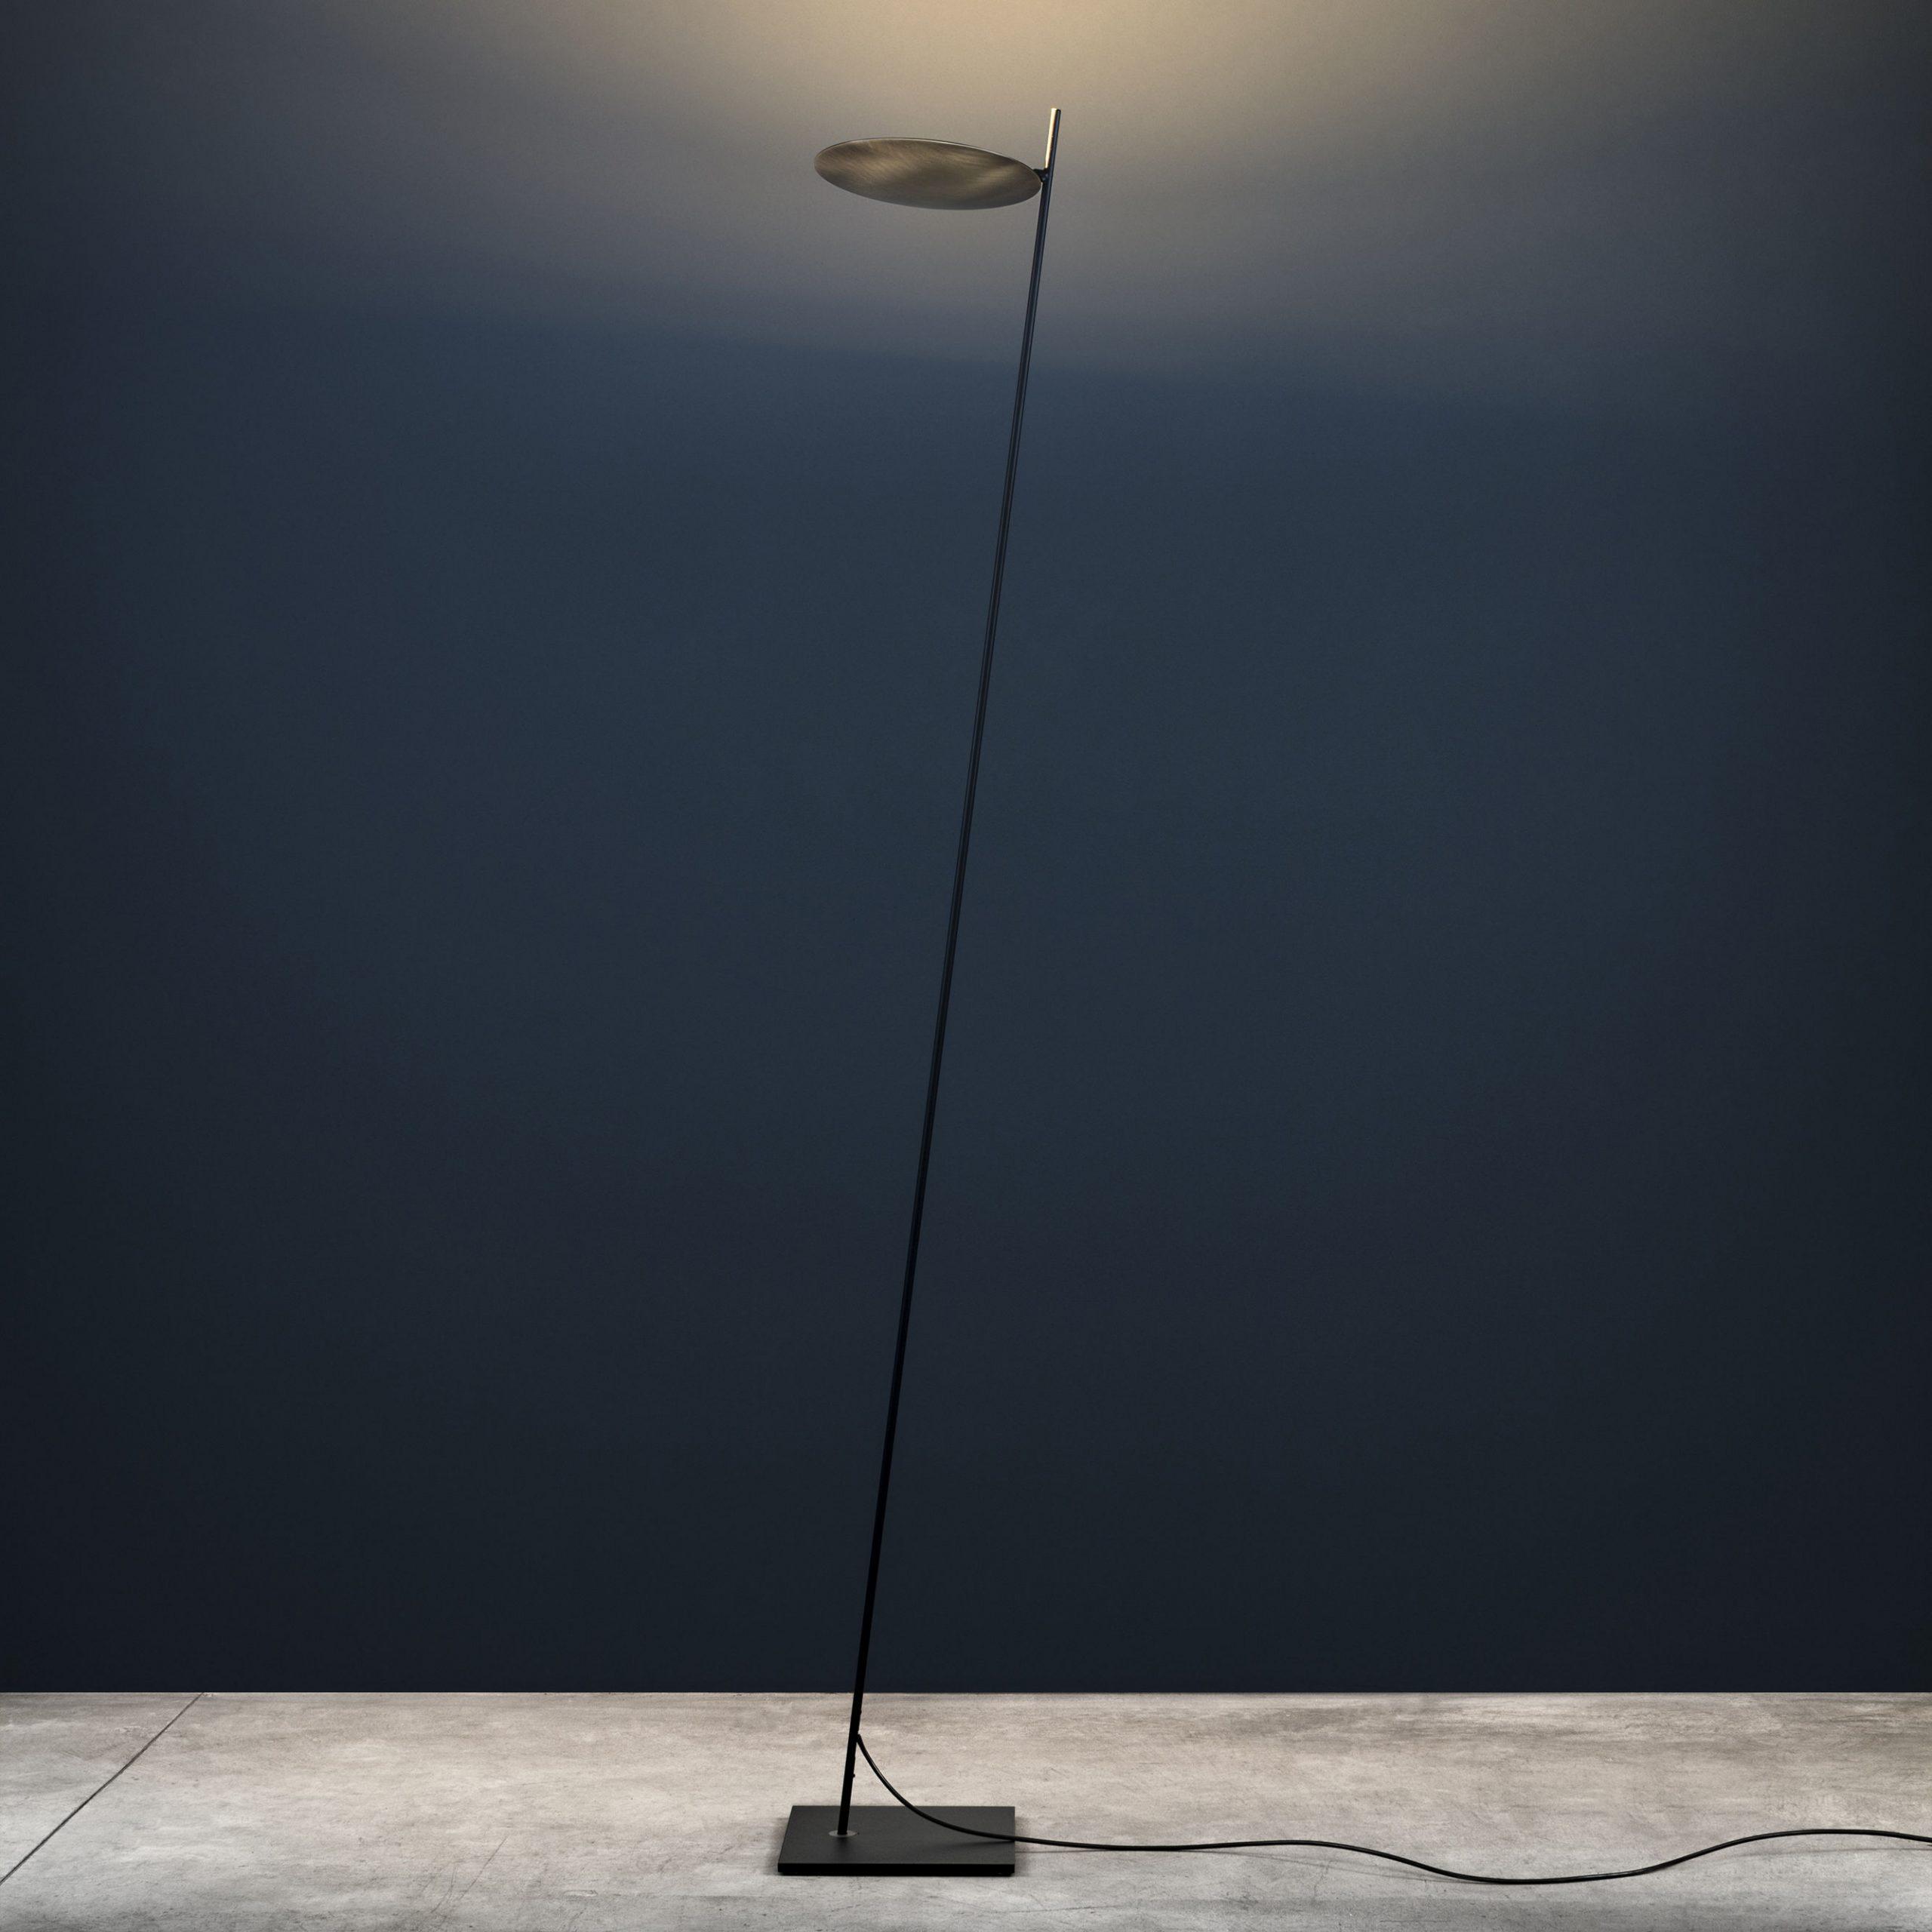 Lederam Φωτιστικό δαπέδου F0 - / LED - H 190 cm Μαύρο | Catellani & Smith Brass Enzo Catellani